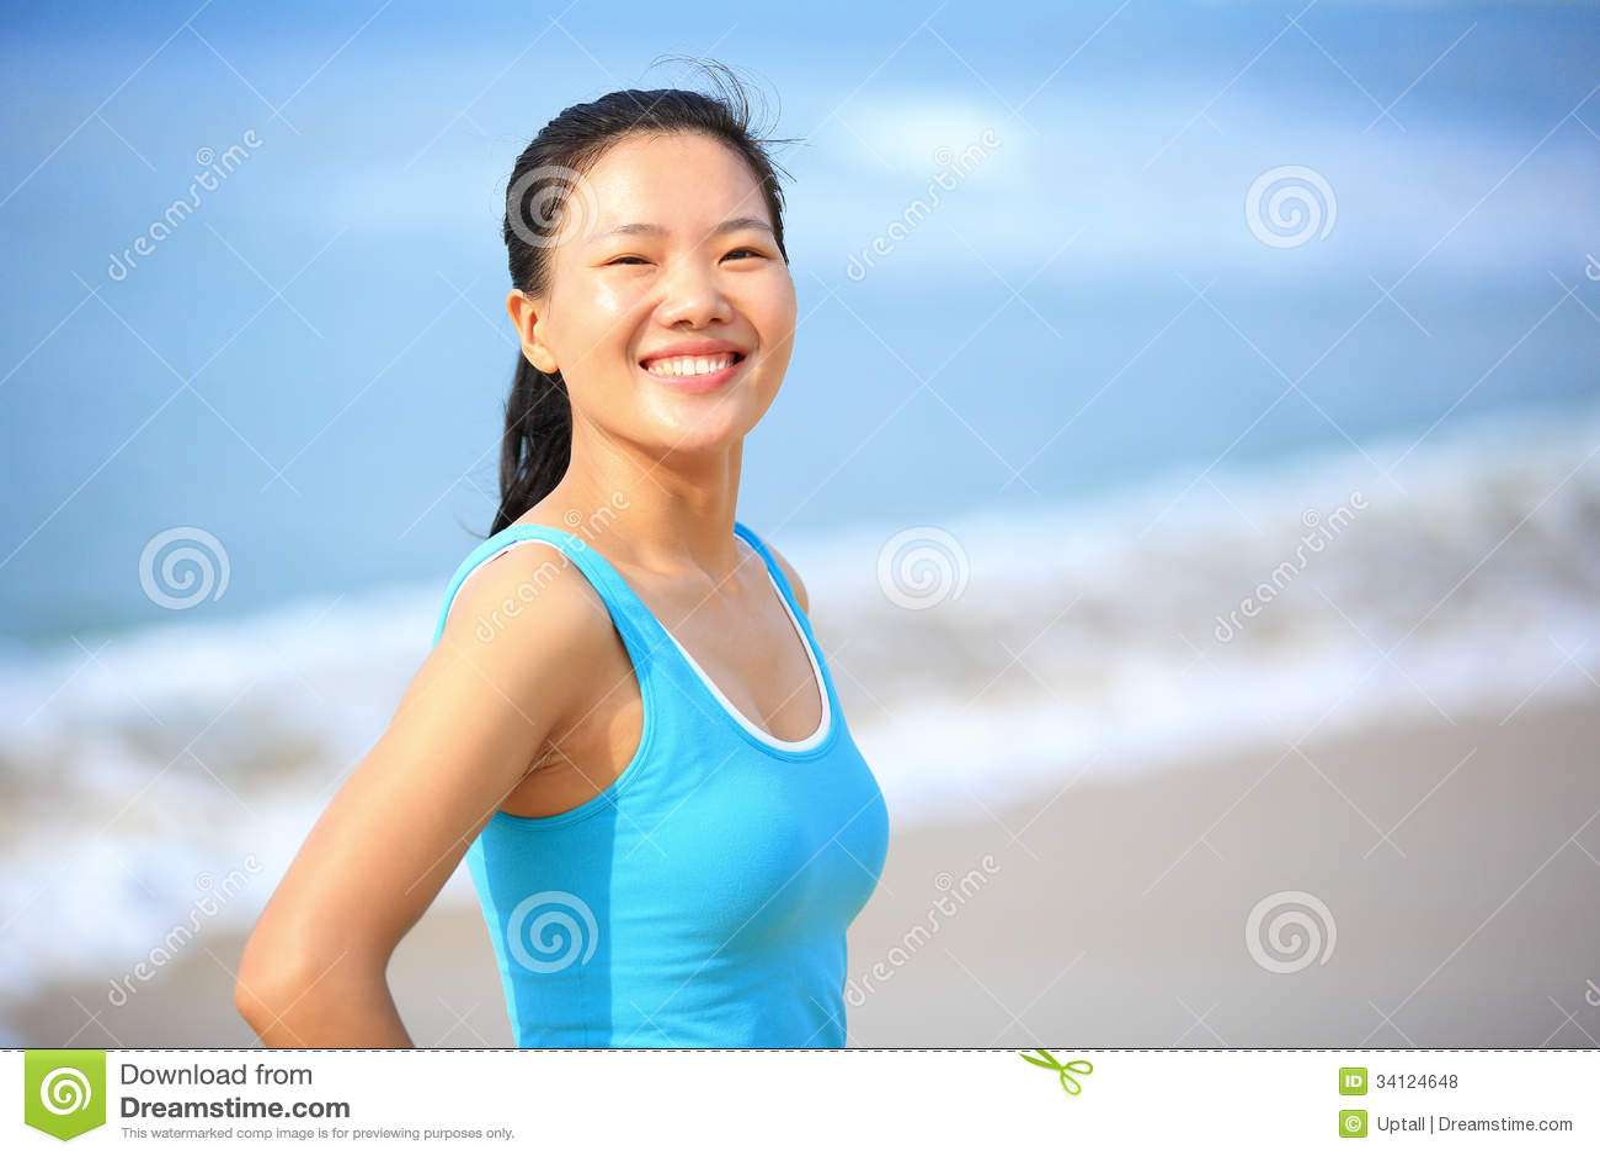 asian woman sports